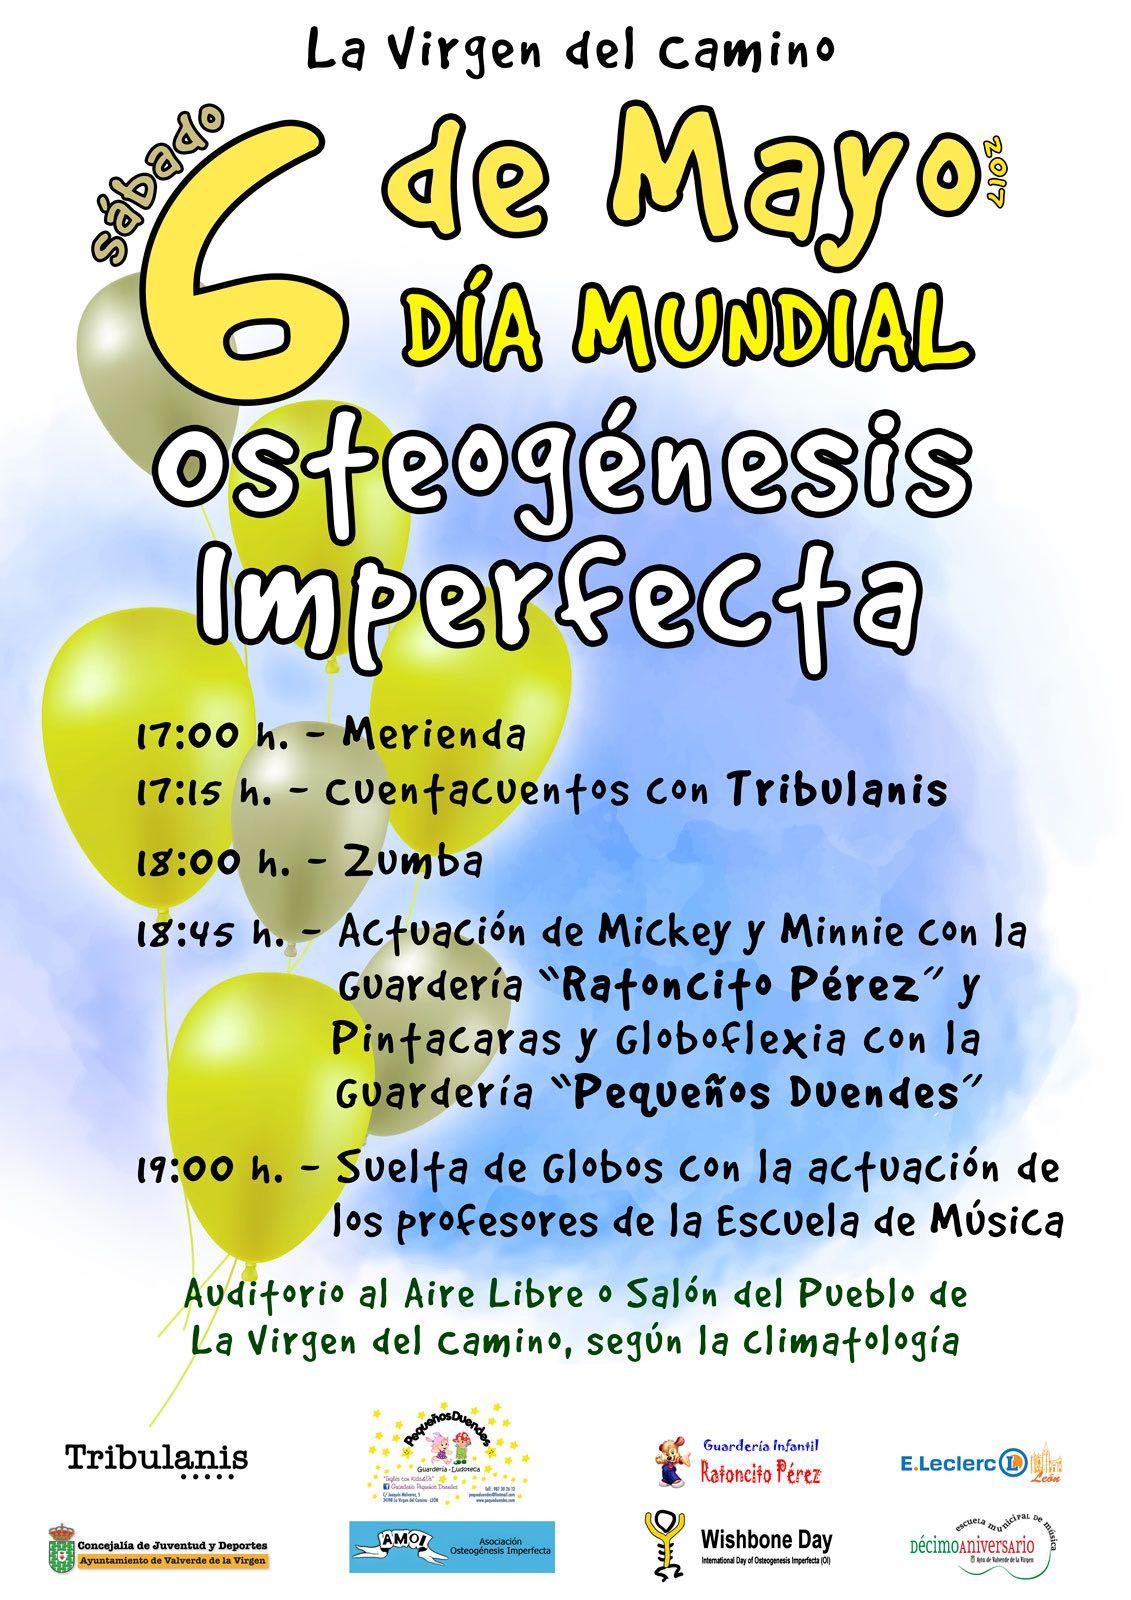 Programa Día Mundial de la Osteogénesis Imperfecta